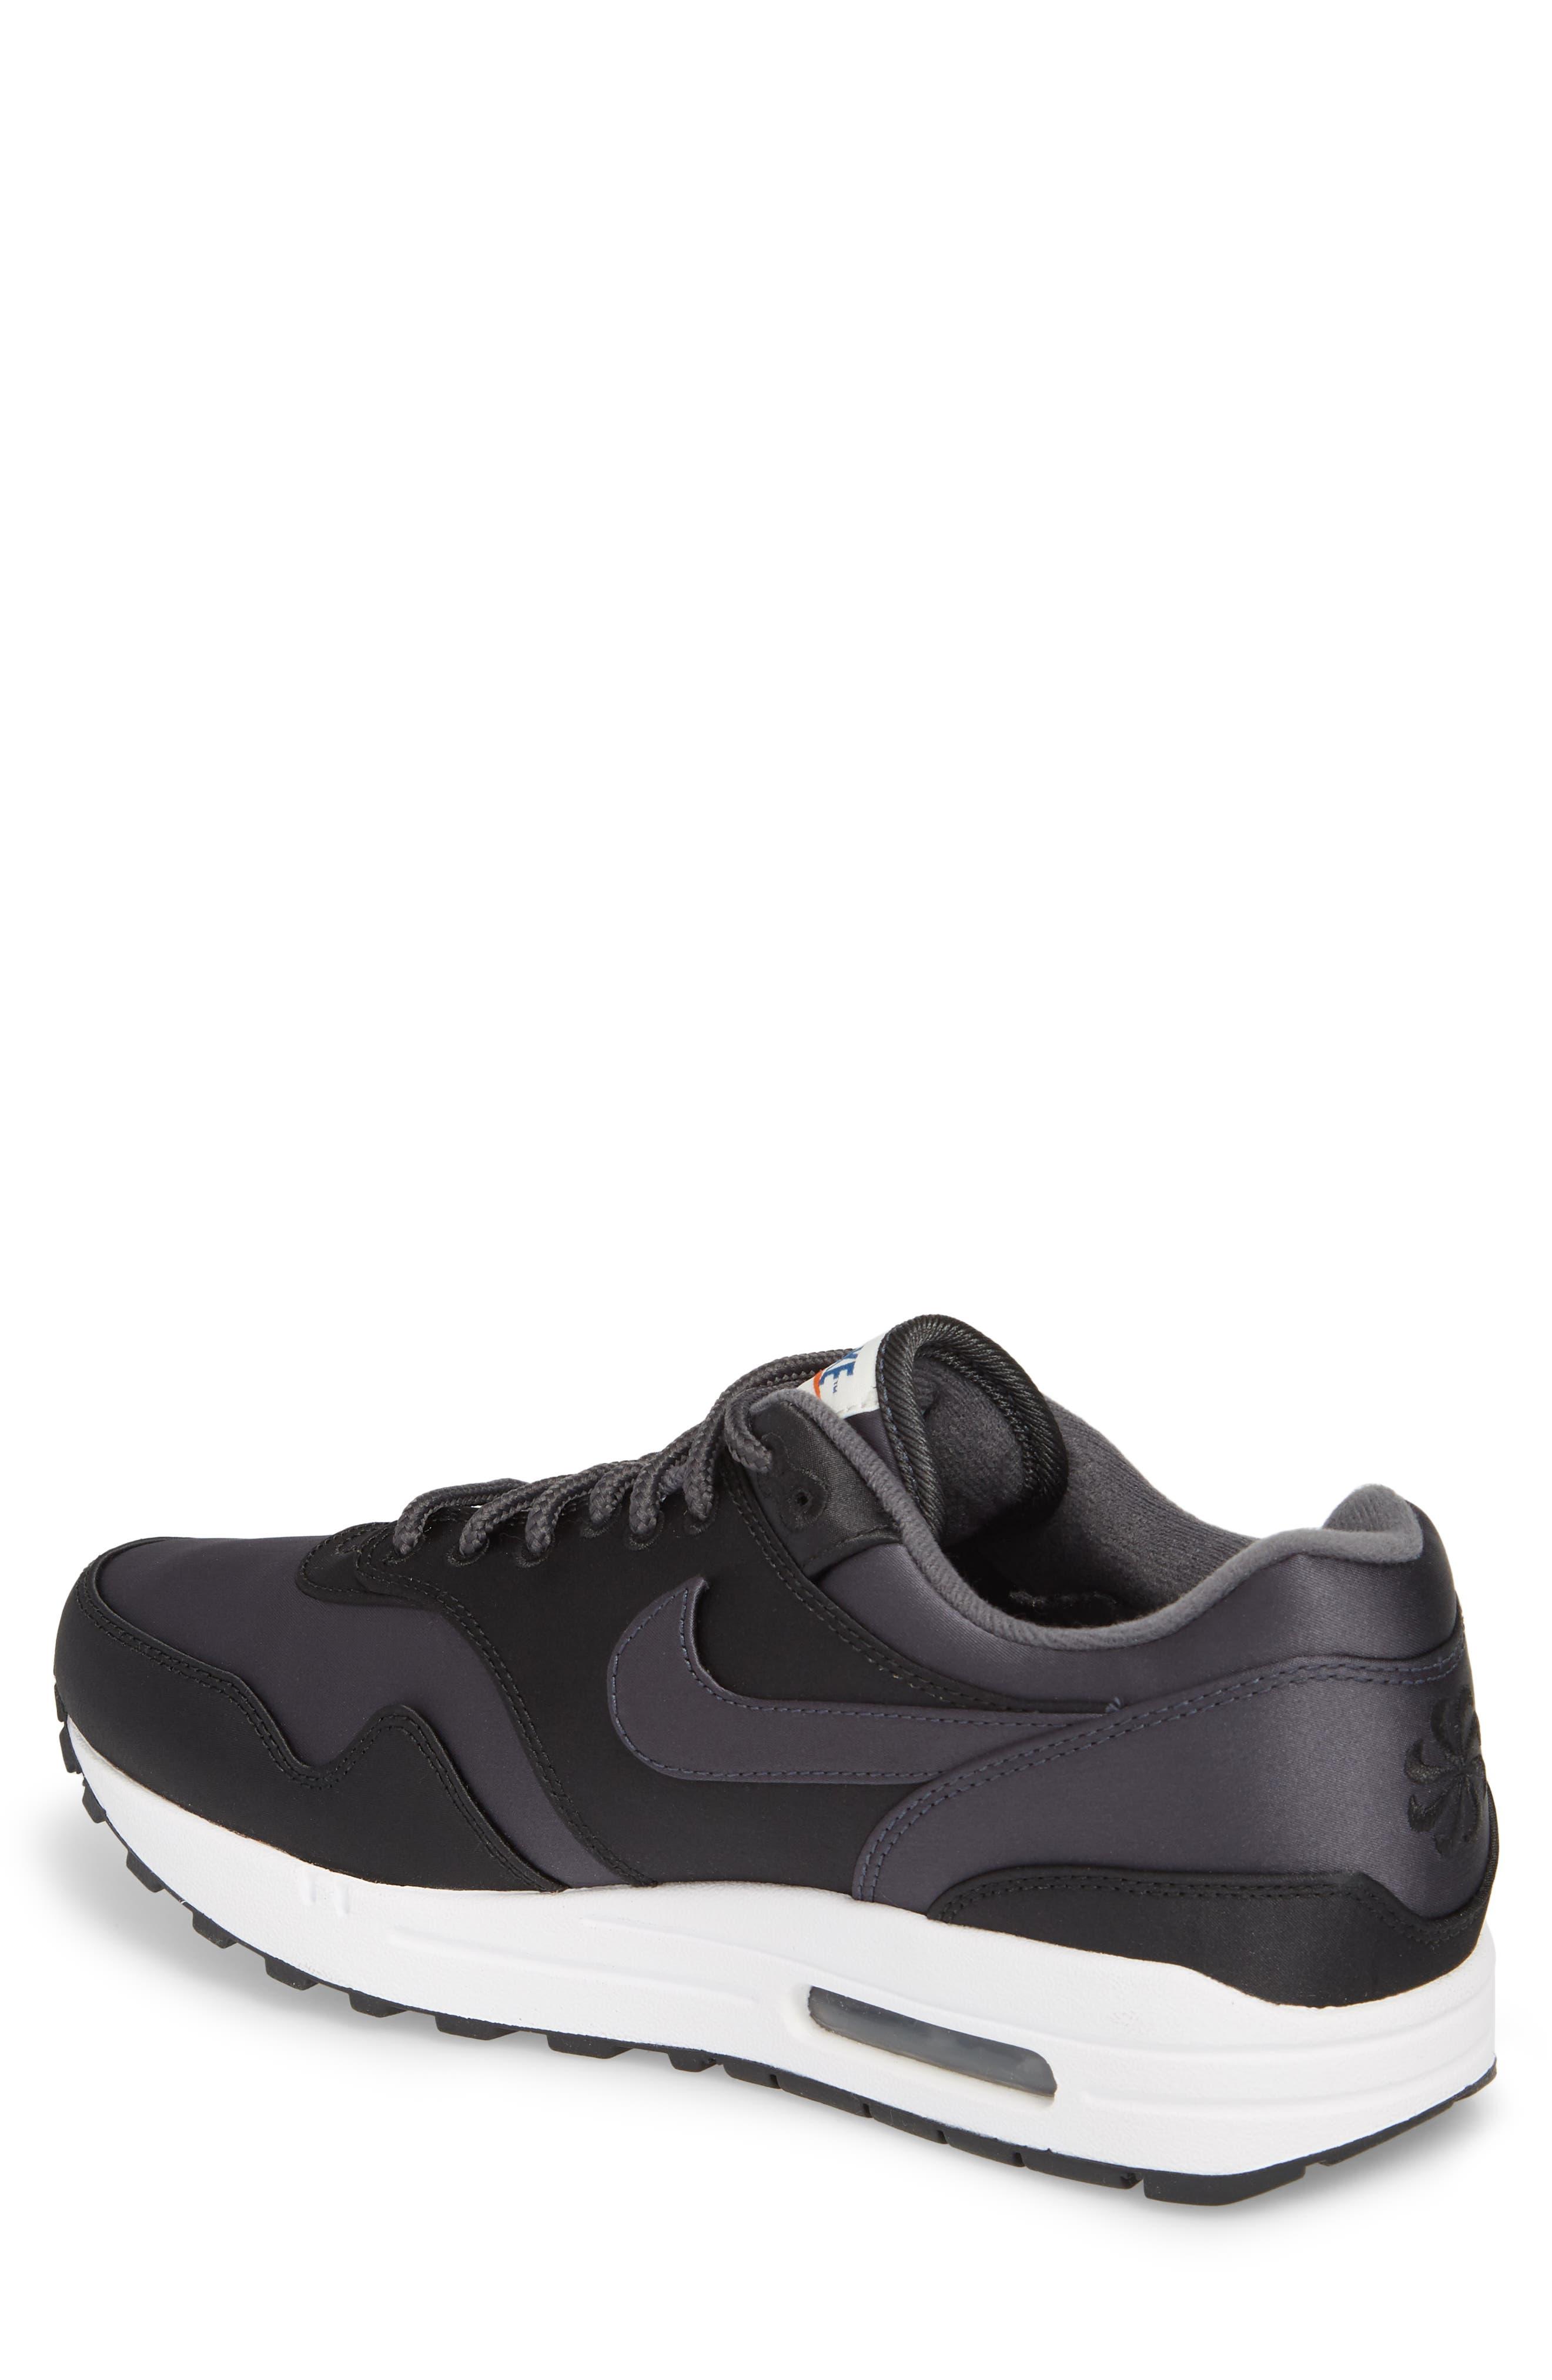 Air Max 1 SE Sneaker,                             Alternate thumbnail 2, color,                             Black/ Anthracite/ White